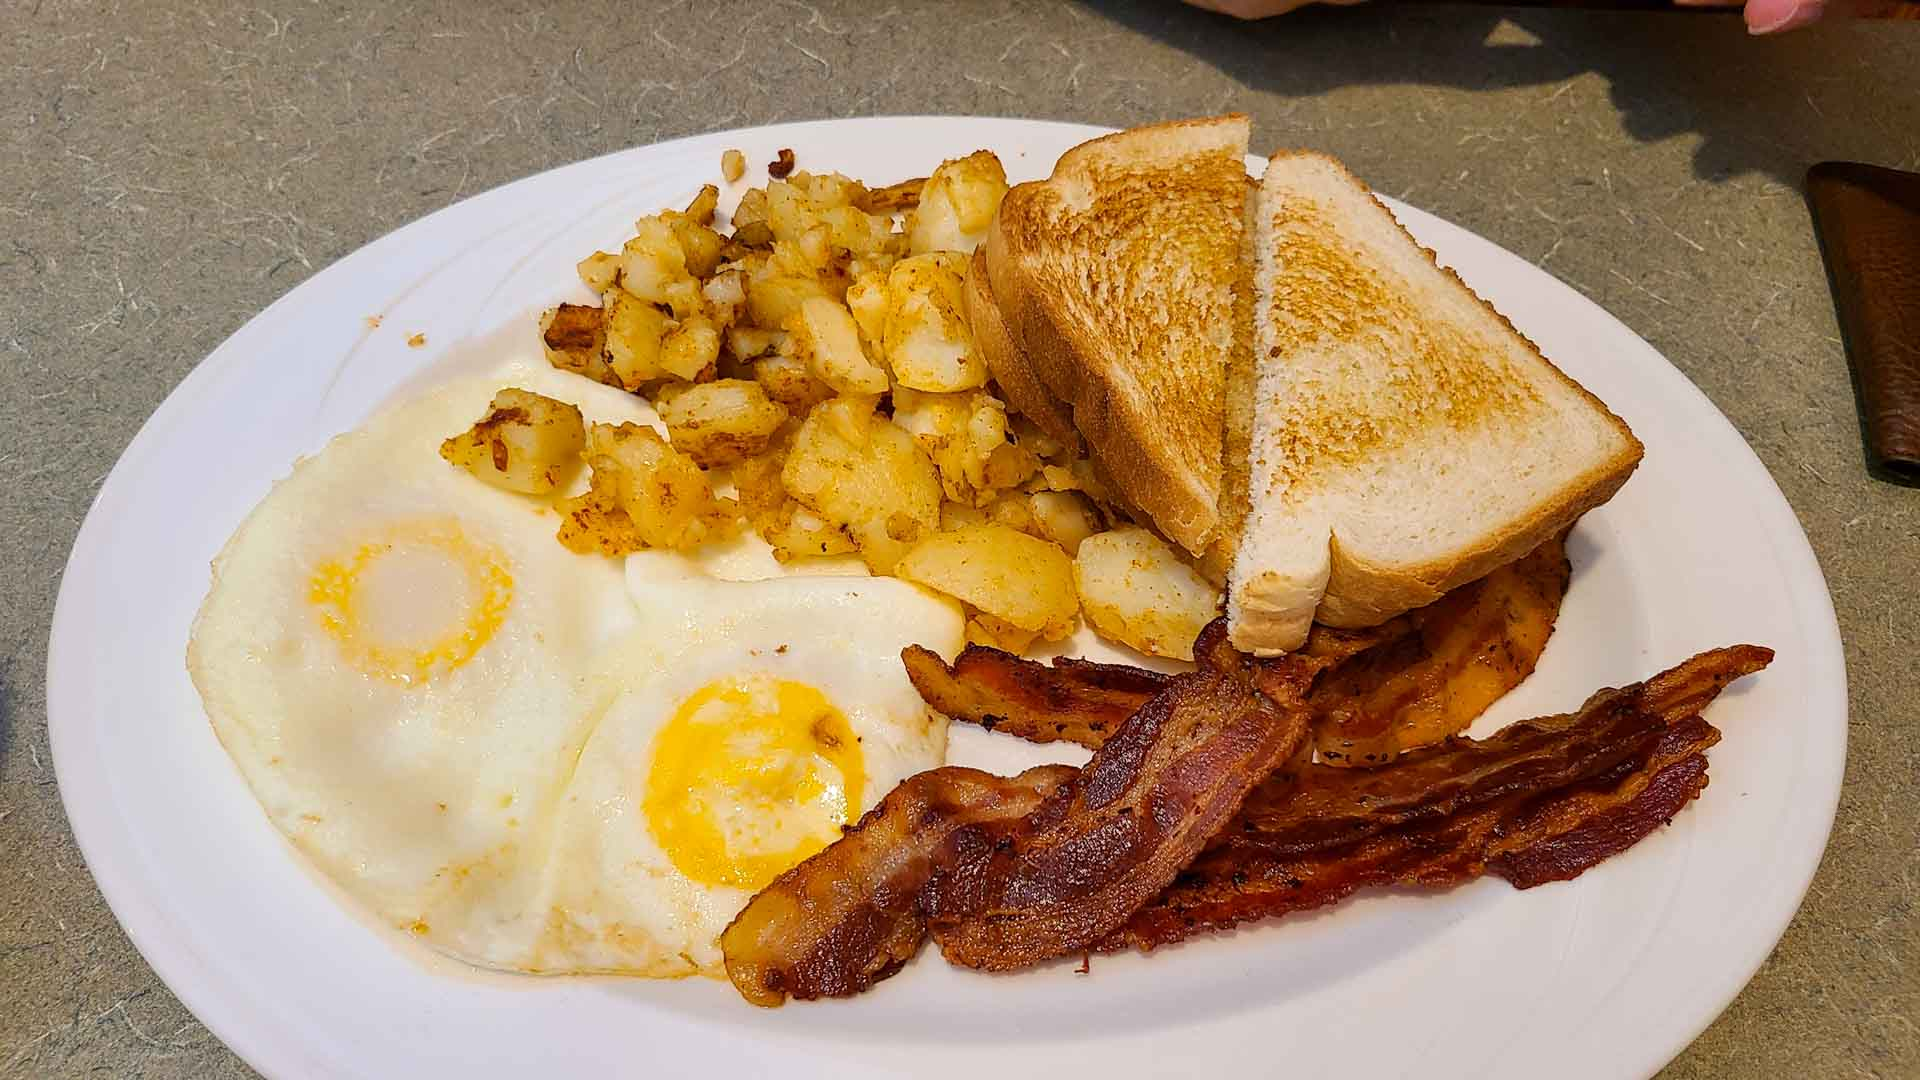 Desayuno en Curly's Family Restaurant, Watkins Glen, Nueva York